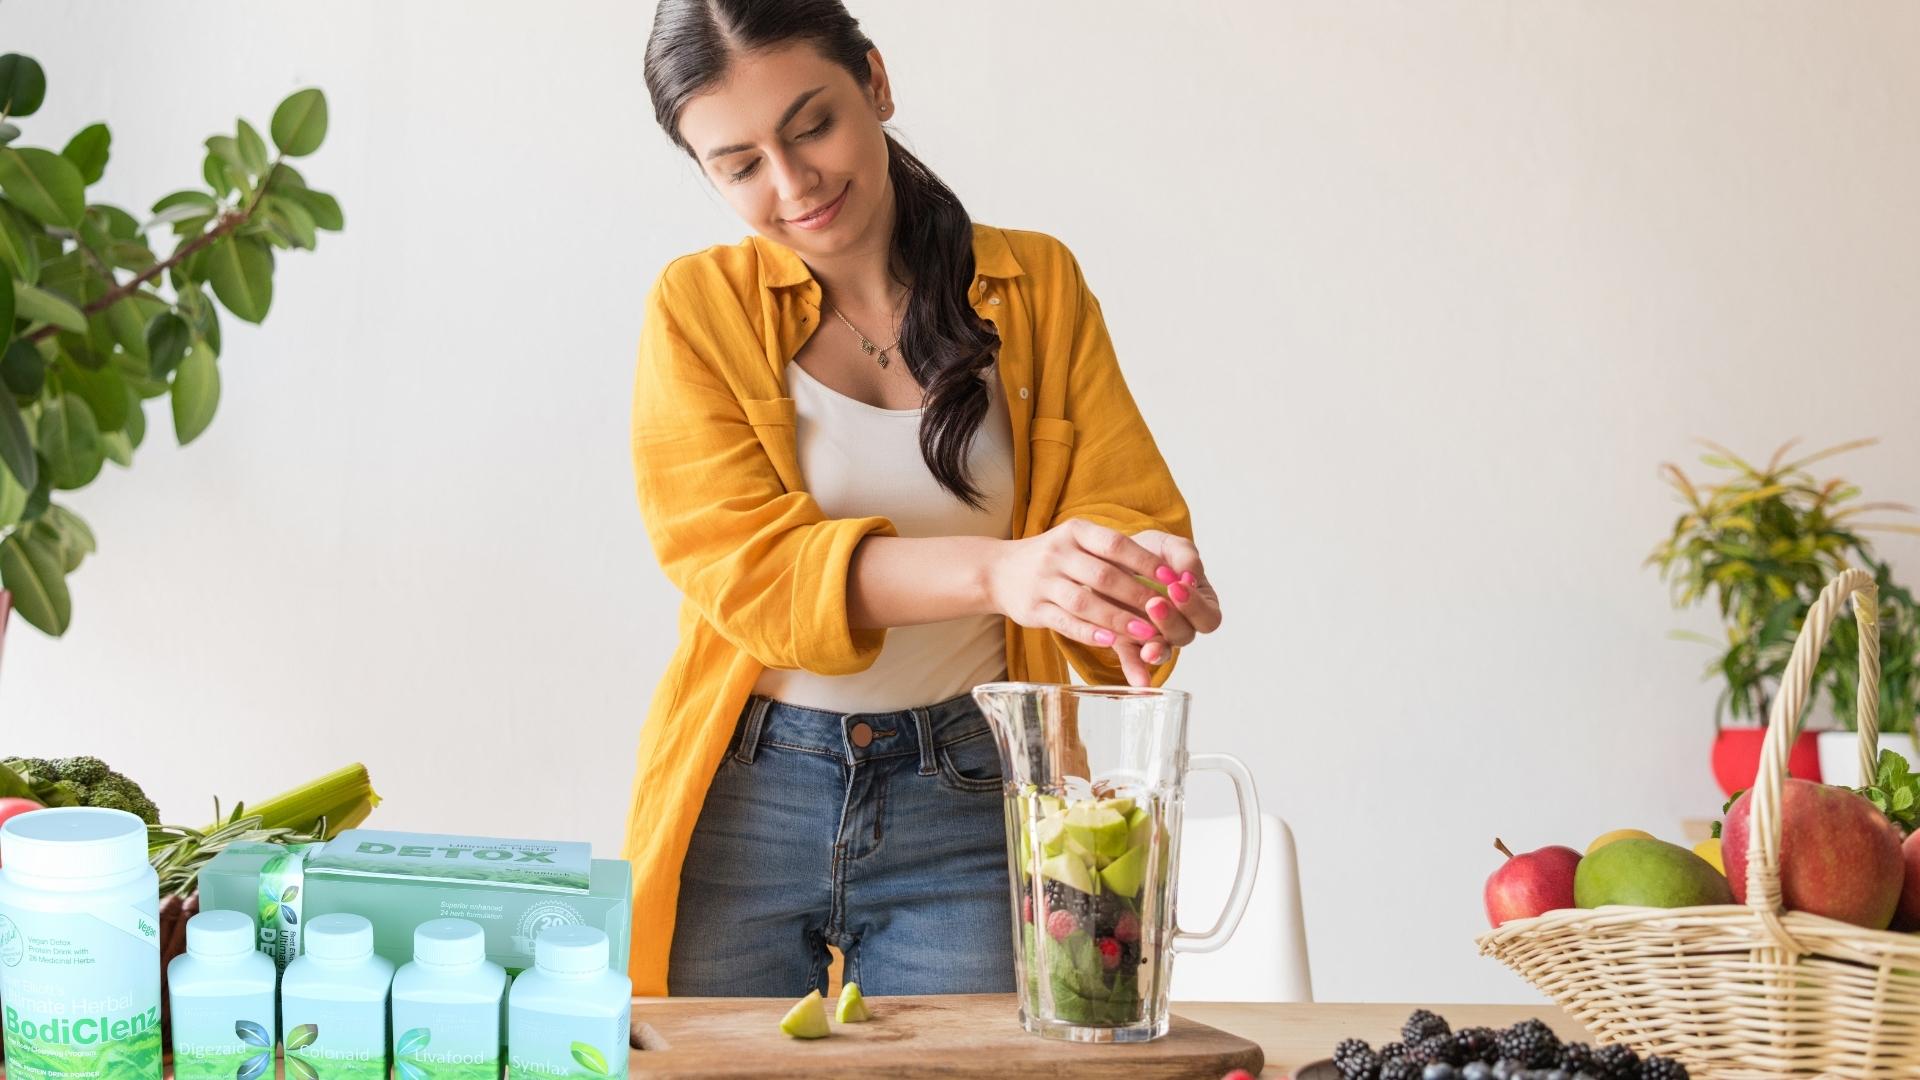 Woman Adding Vegetables in a Blender